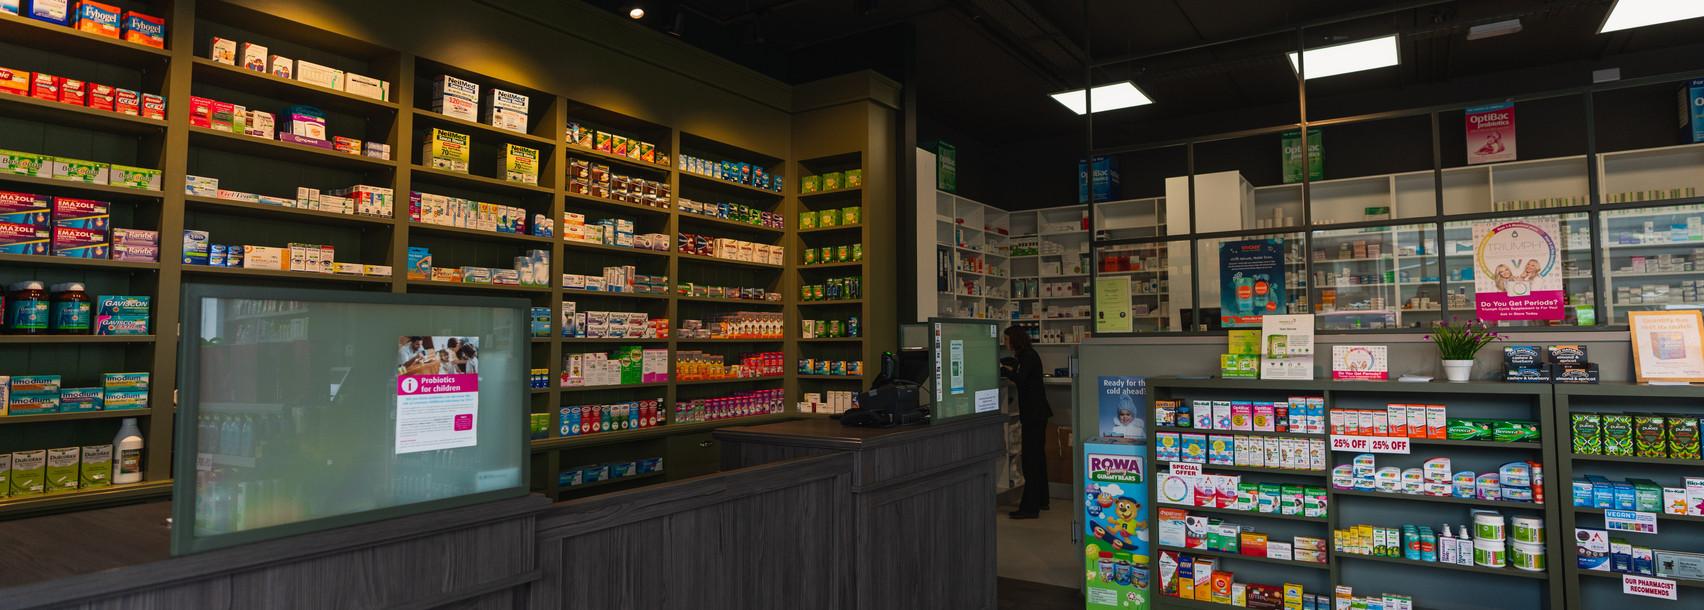 Zest Pharmacy Photos-4444.jpg